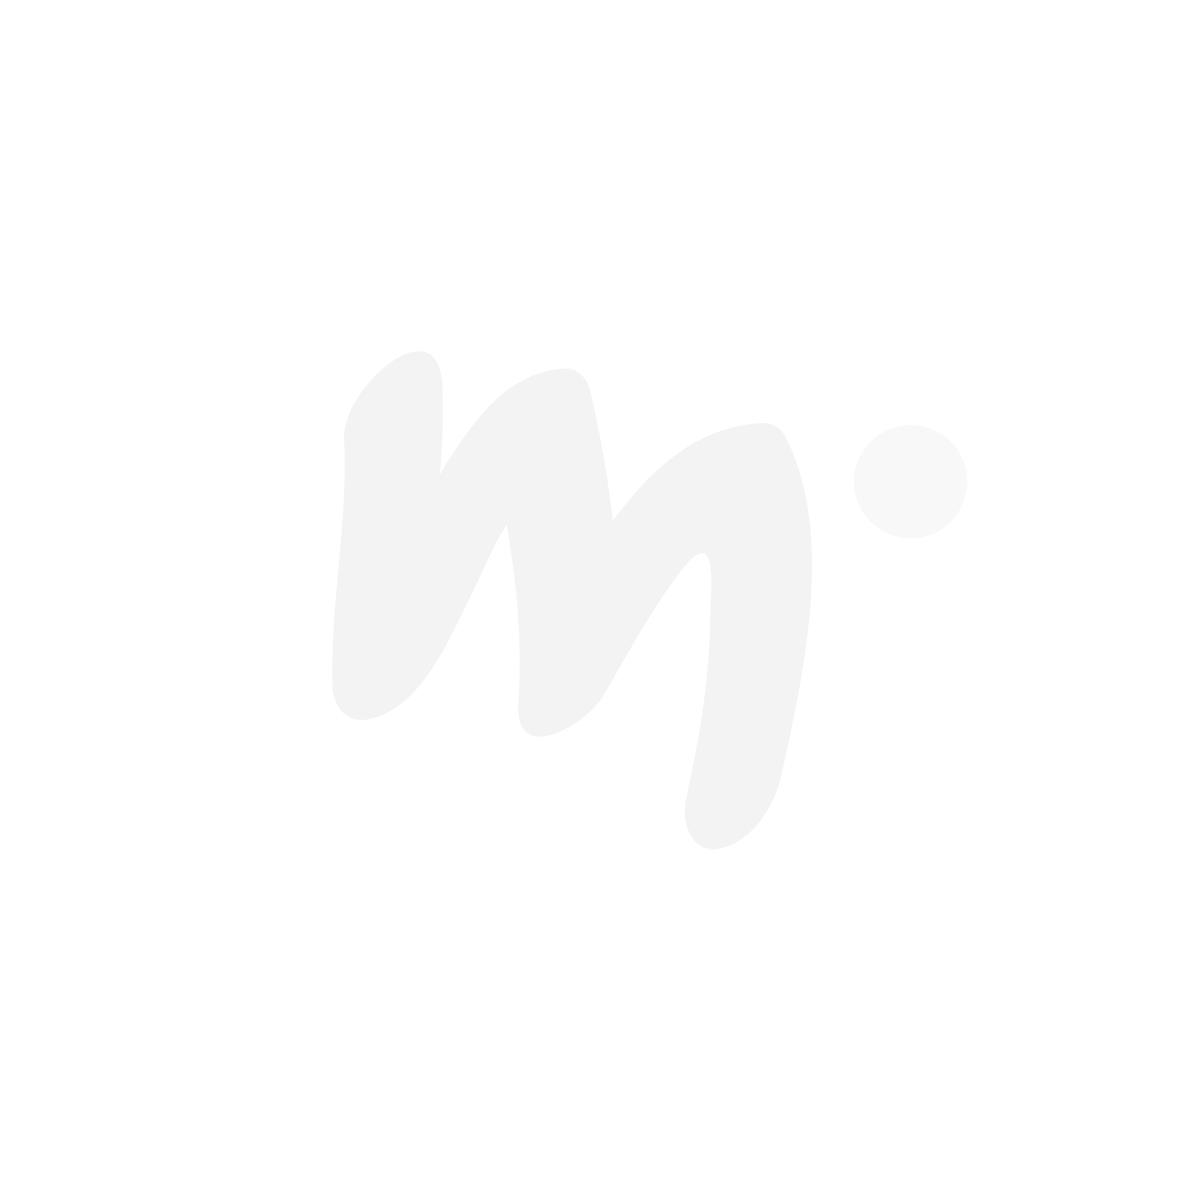 Moomin Nipsu Backpack Fillyjonk